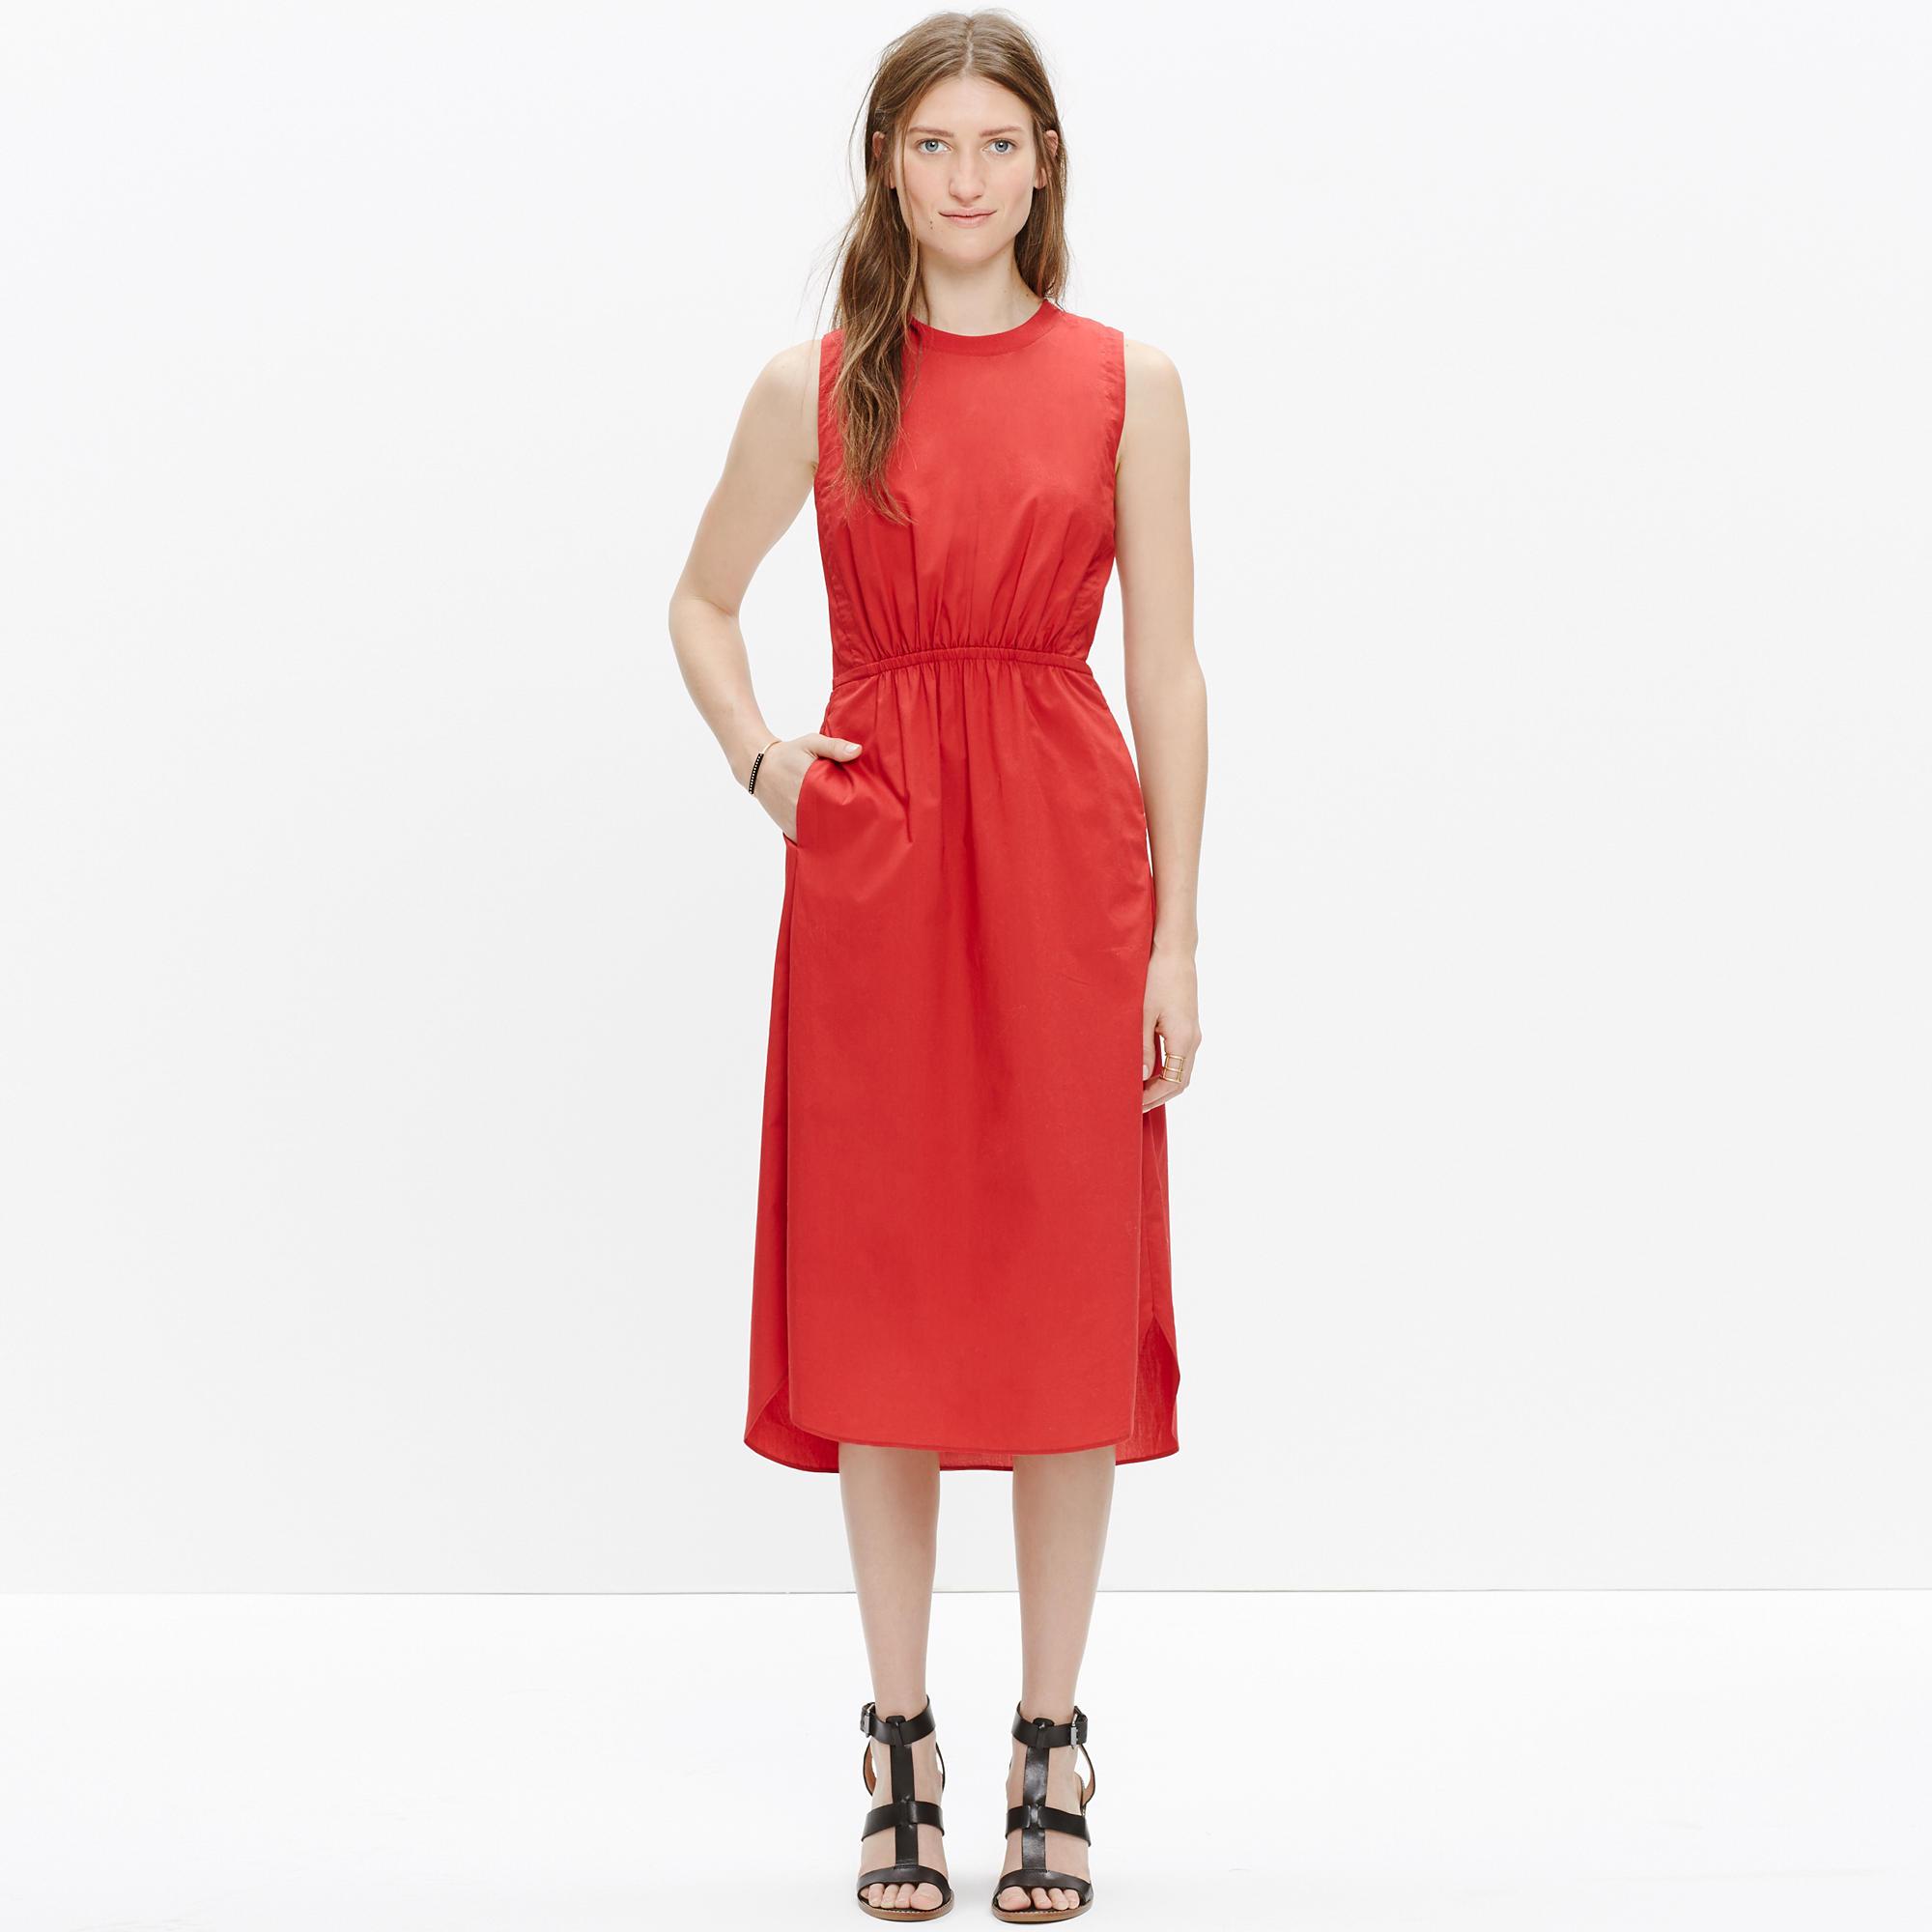 Cotton Lakeshore Midi Dress : midi &amp- maxi dresses - Madewell